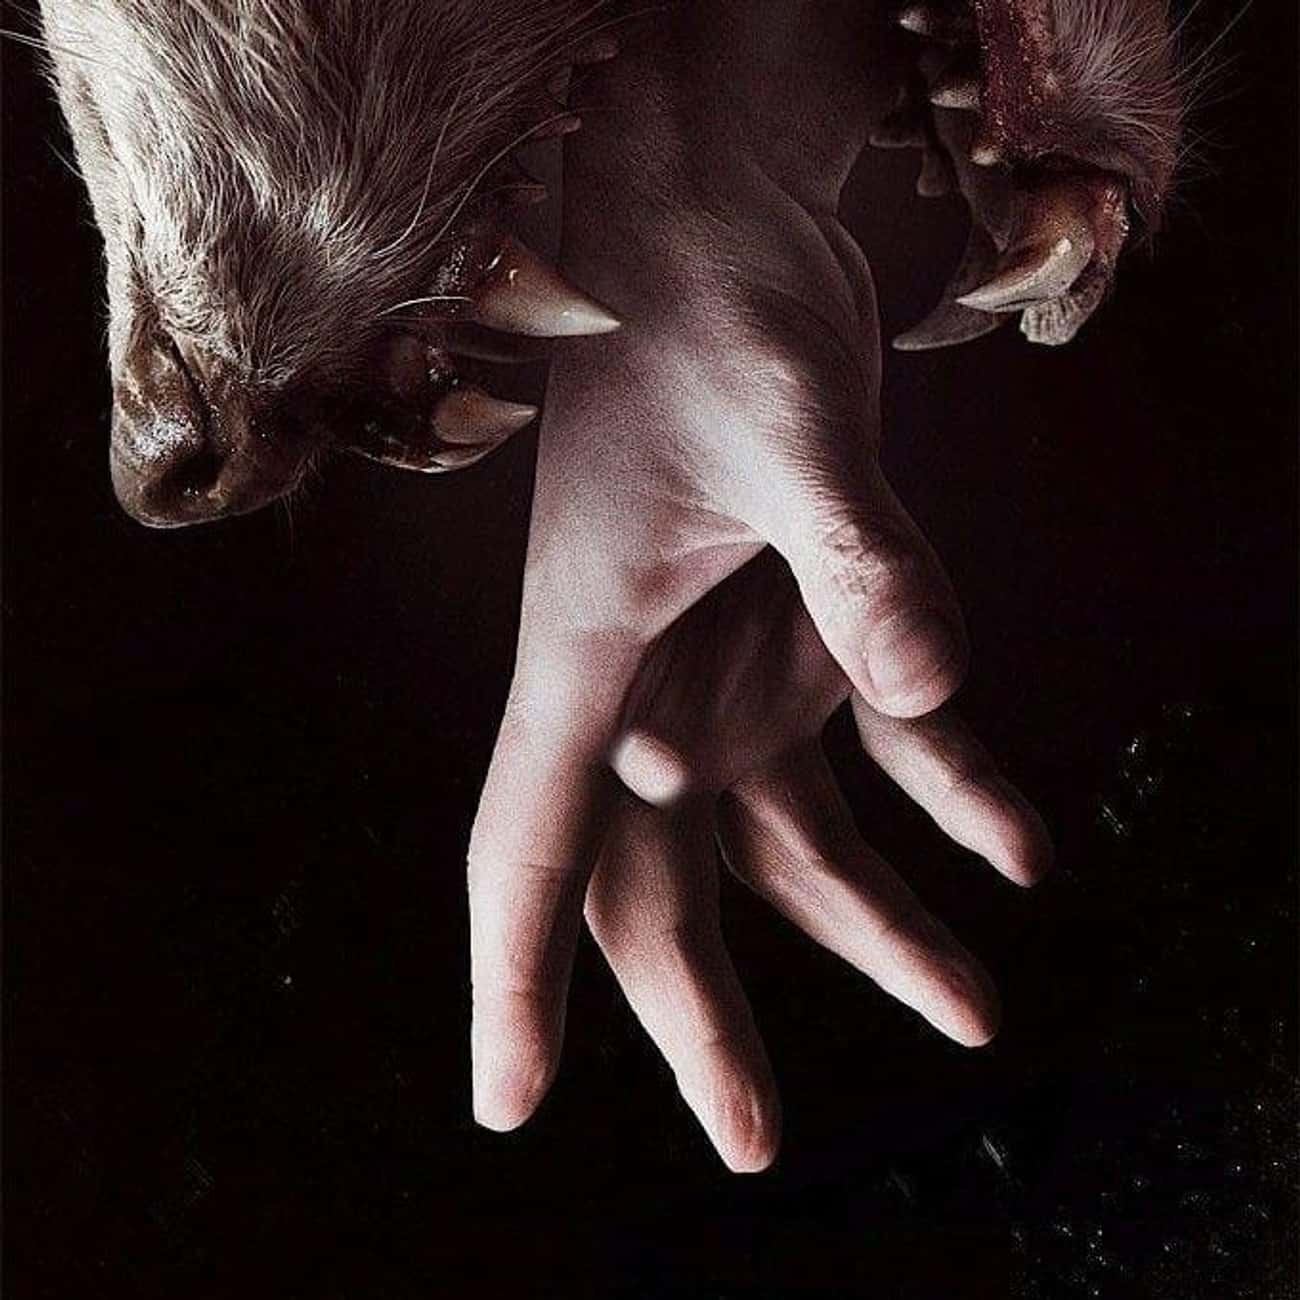 Hemlock Grove - Season 1 is listed (or ranked) 1 on the list Ranking the Best Seasons of 'Hemlock Grove'